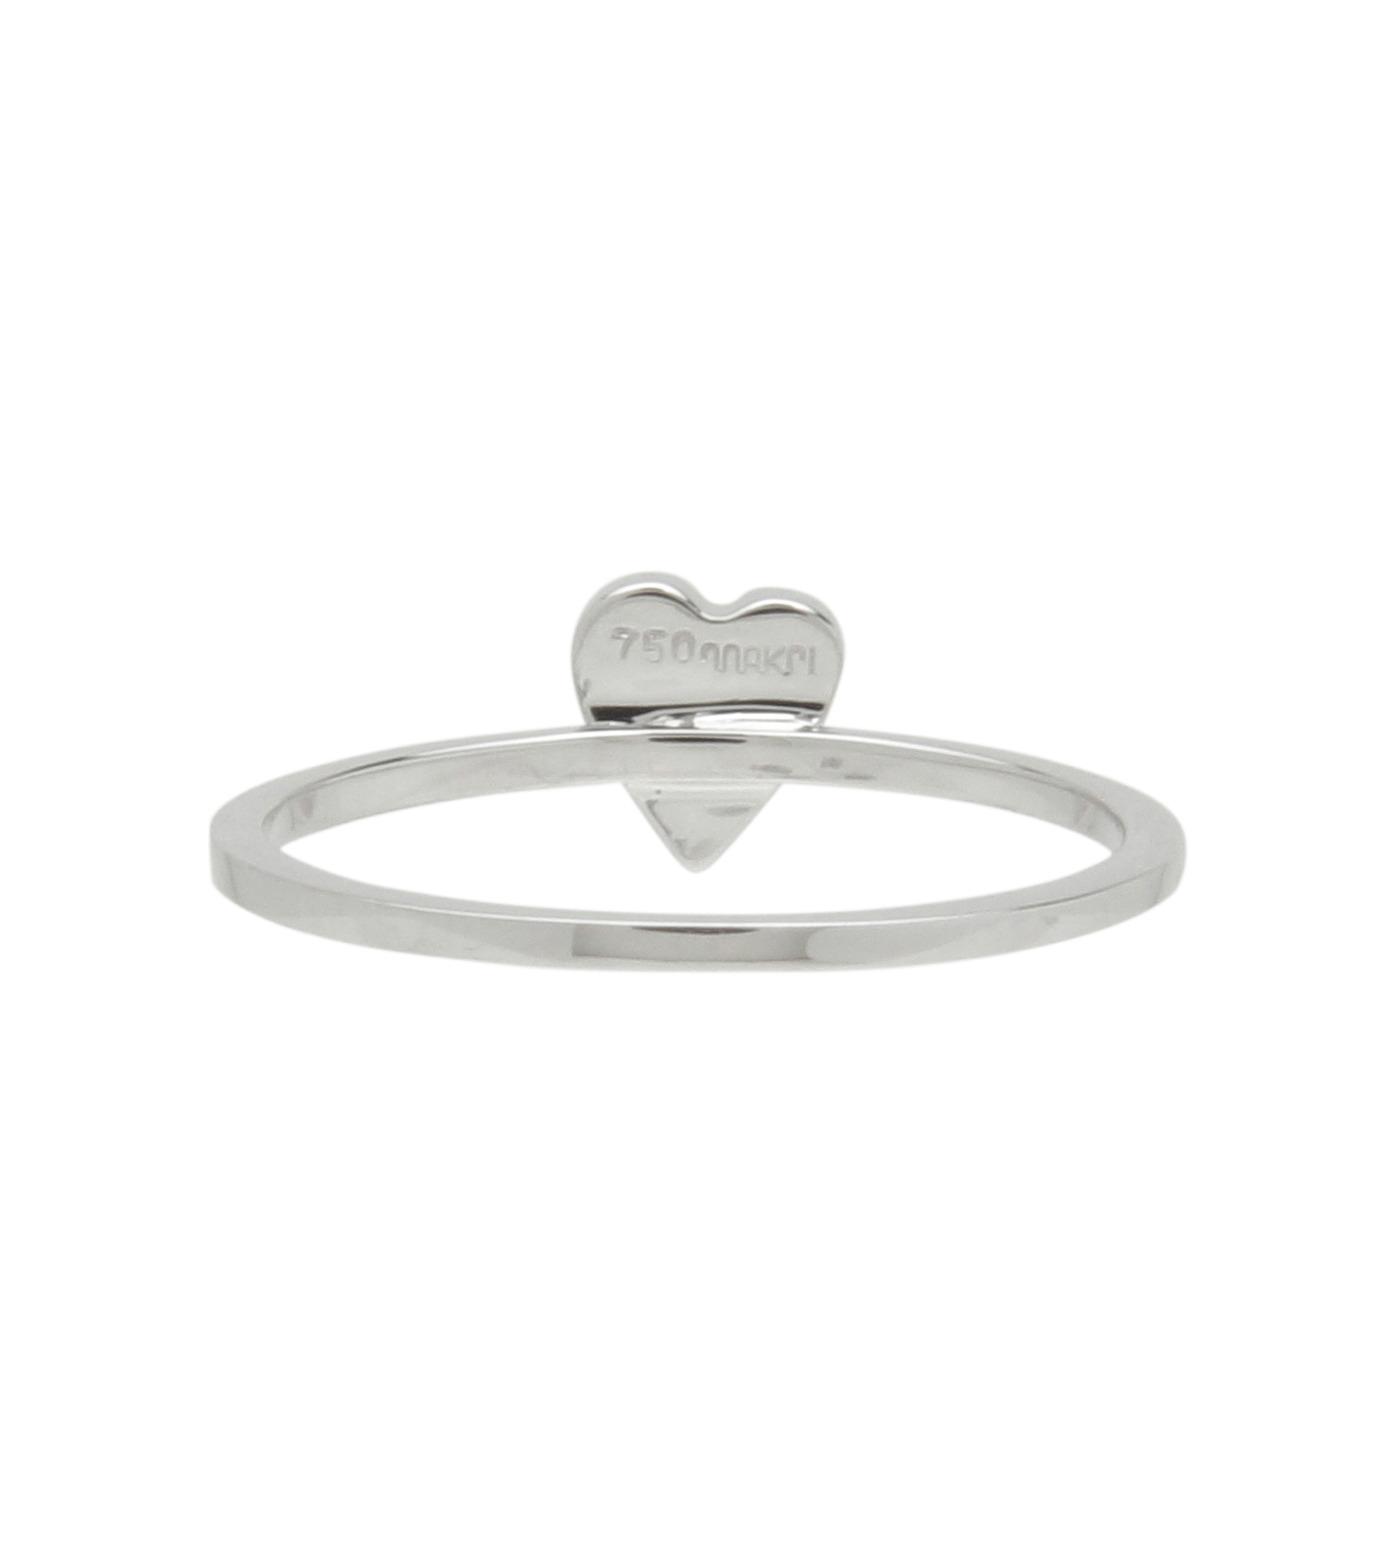 Ileana Makri(イリーナ マクリ)のLove Ring White Gold-Diamond-SILVER(リング/ring)-O272-01-001-1 拡大詳細画像3